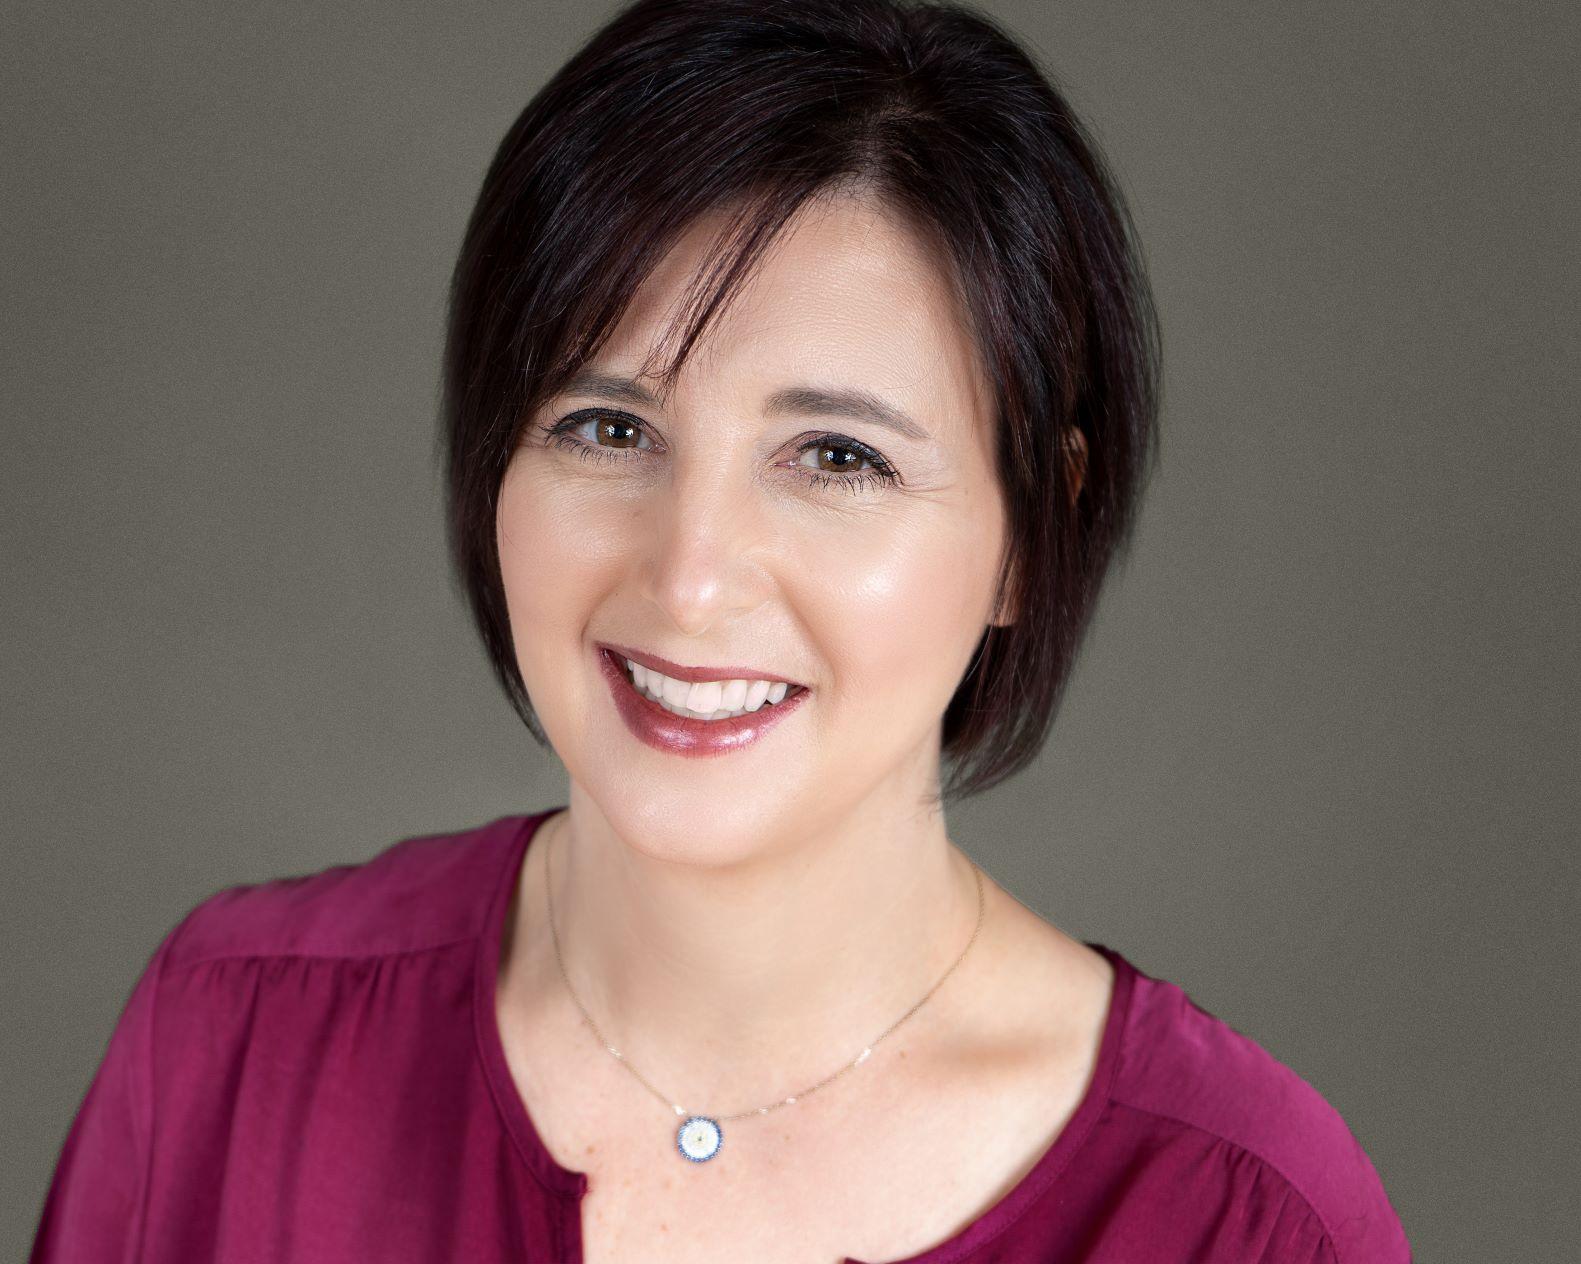 Professional portrait of Erin Shepansky